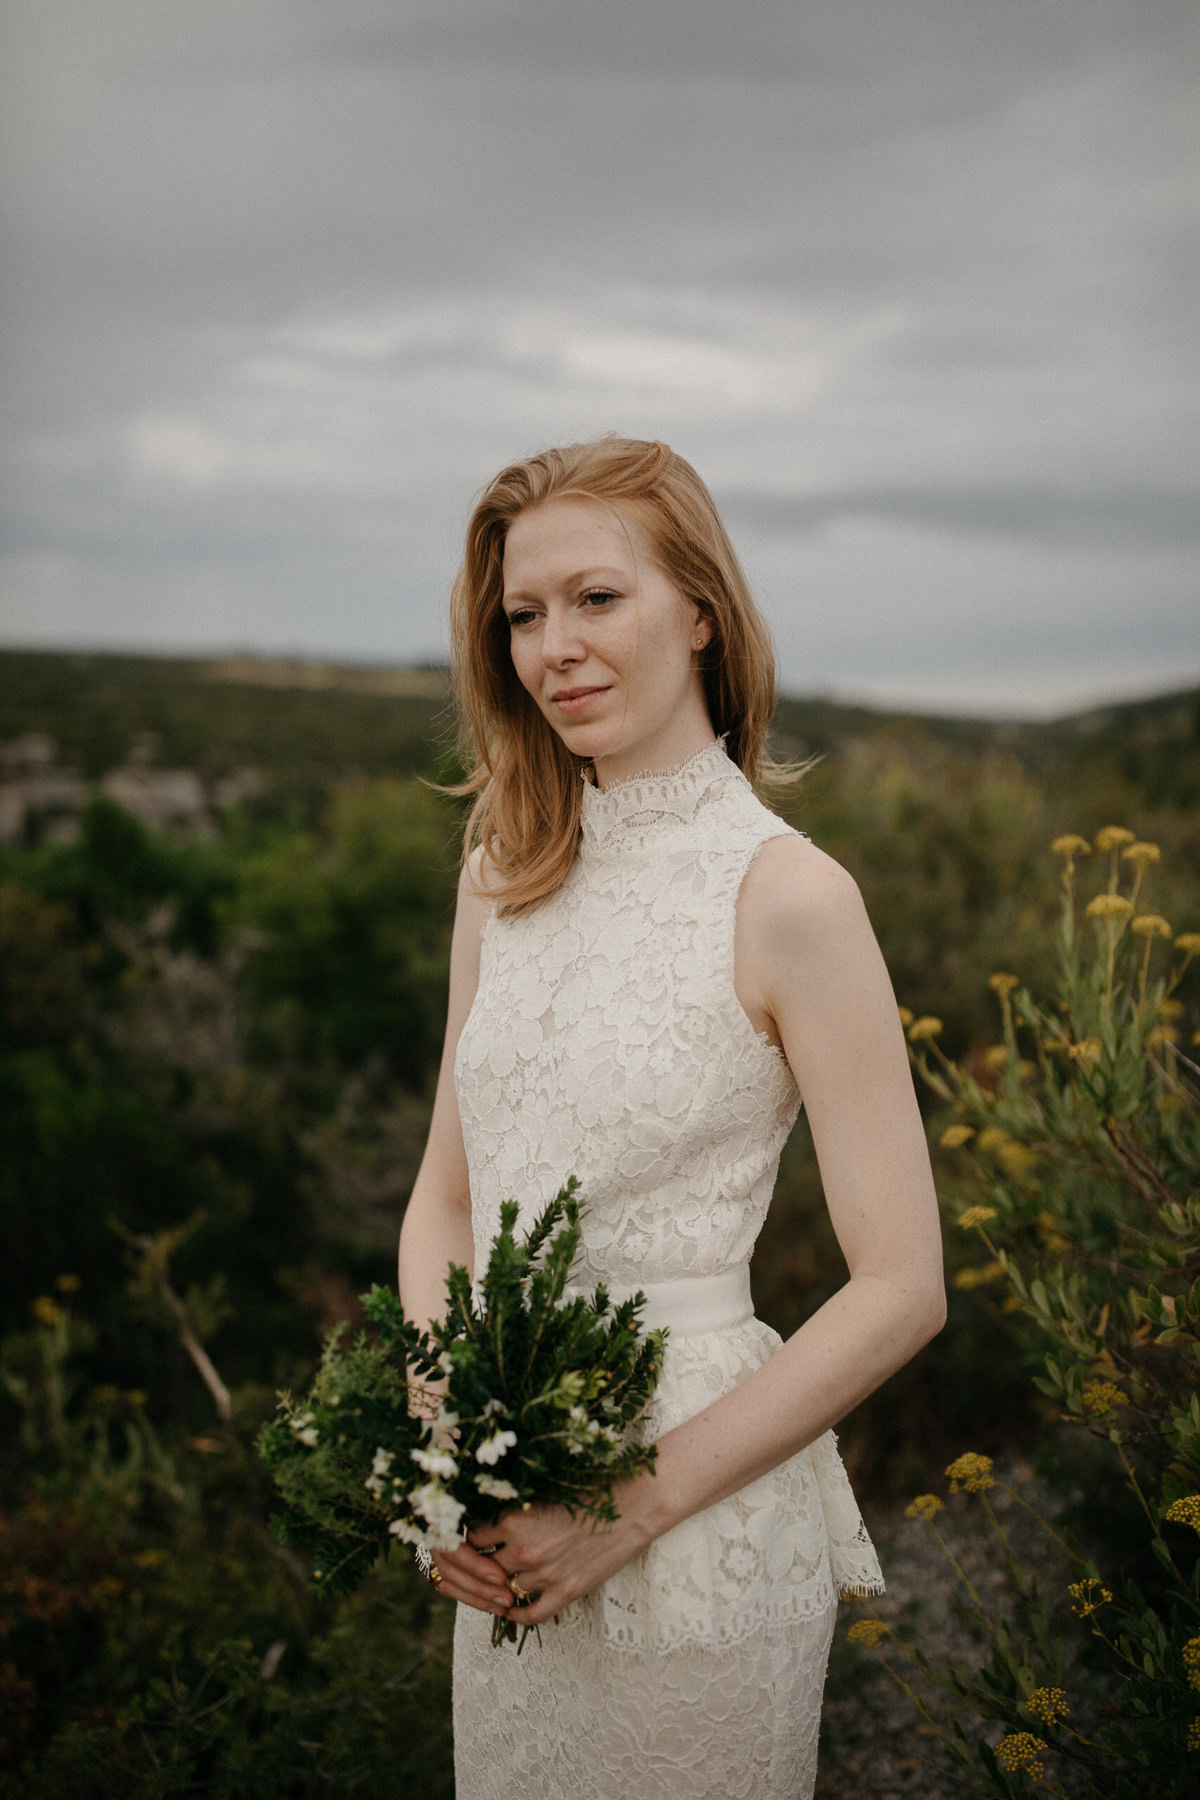 299-lifestories-photography-wedding-Frances-Jonah-2017-_MG_2971